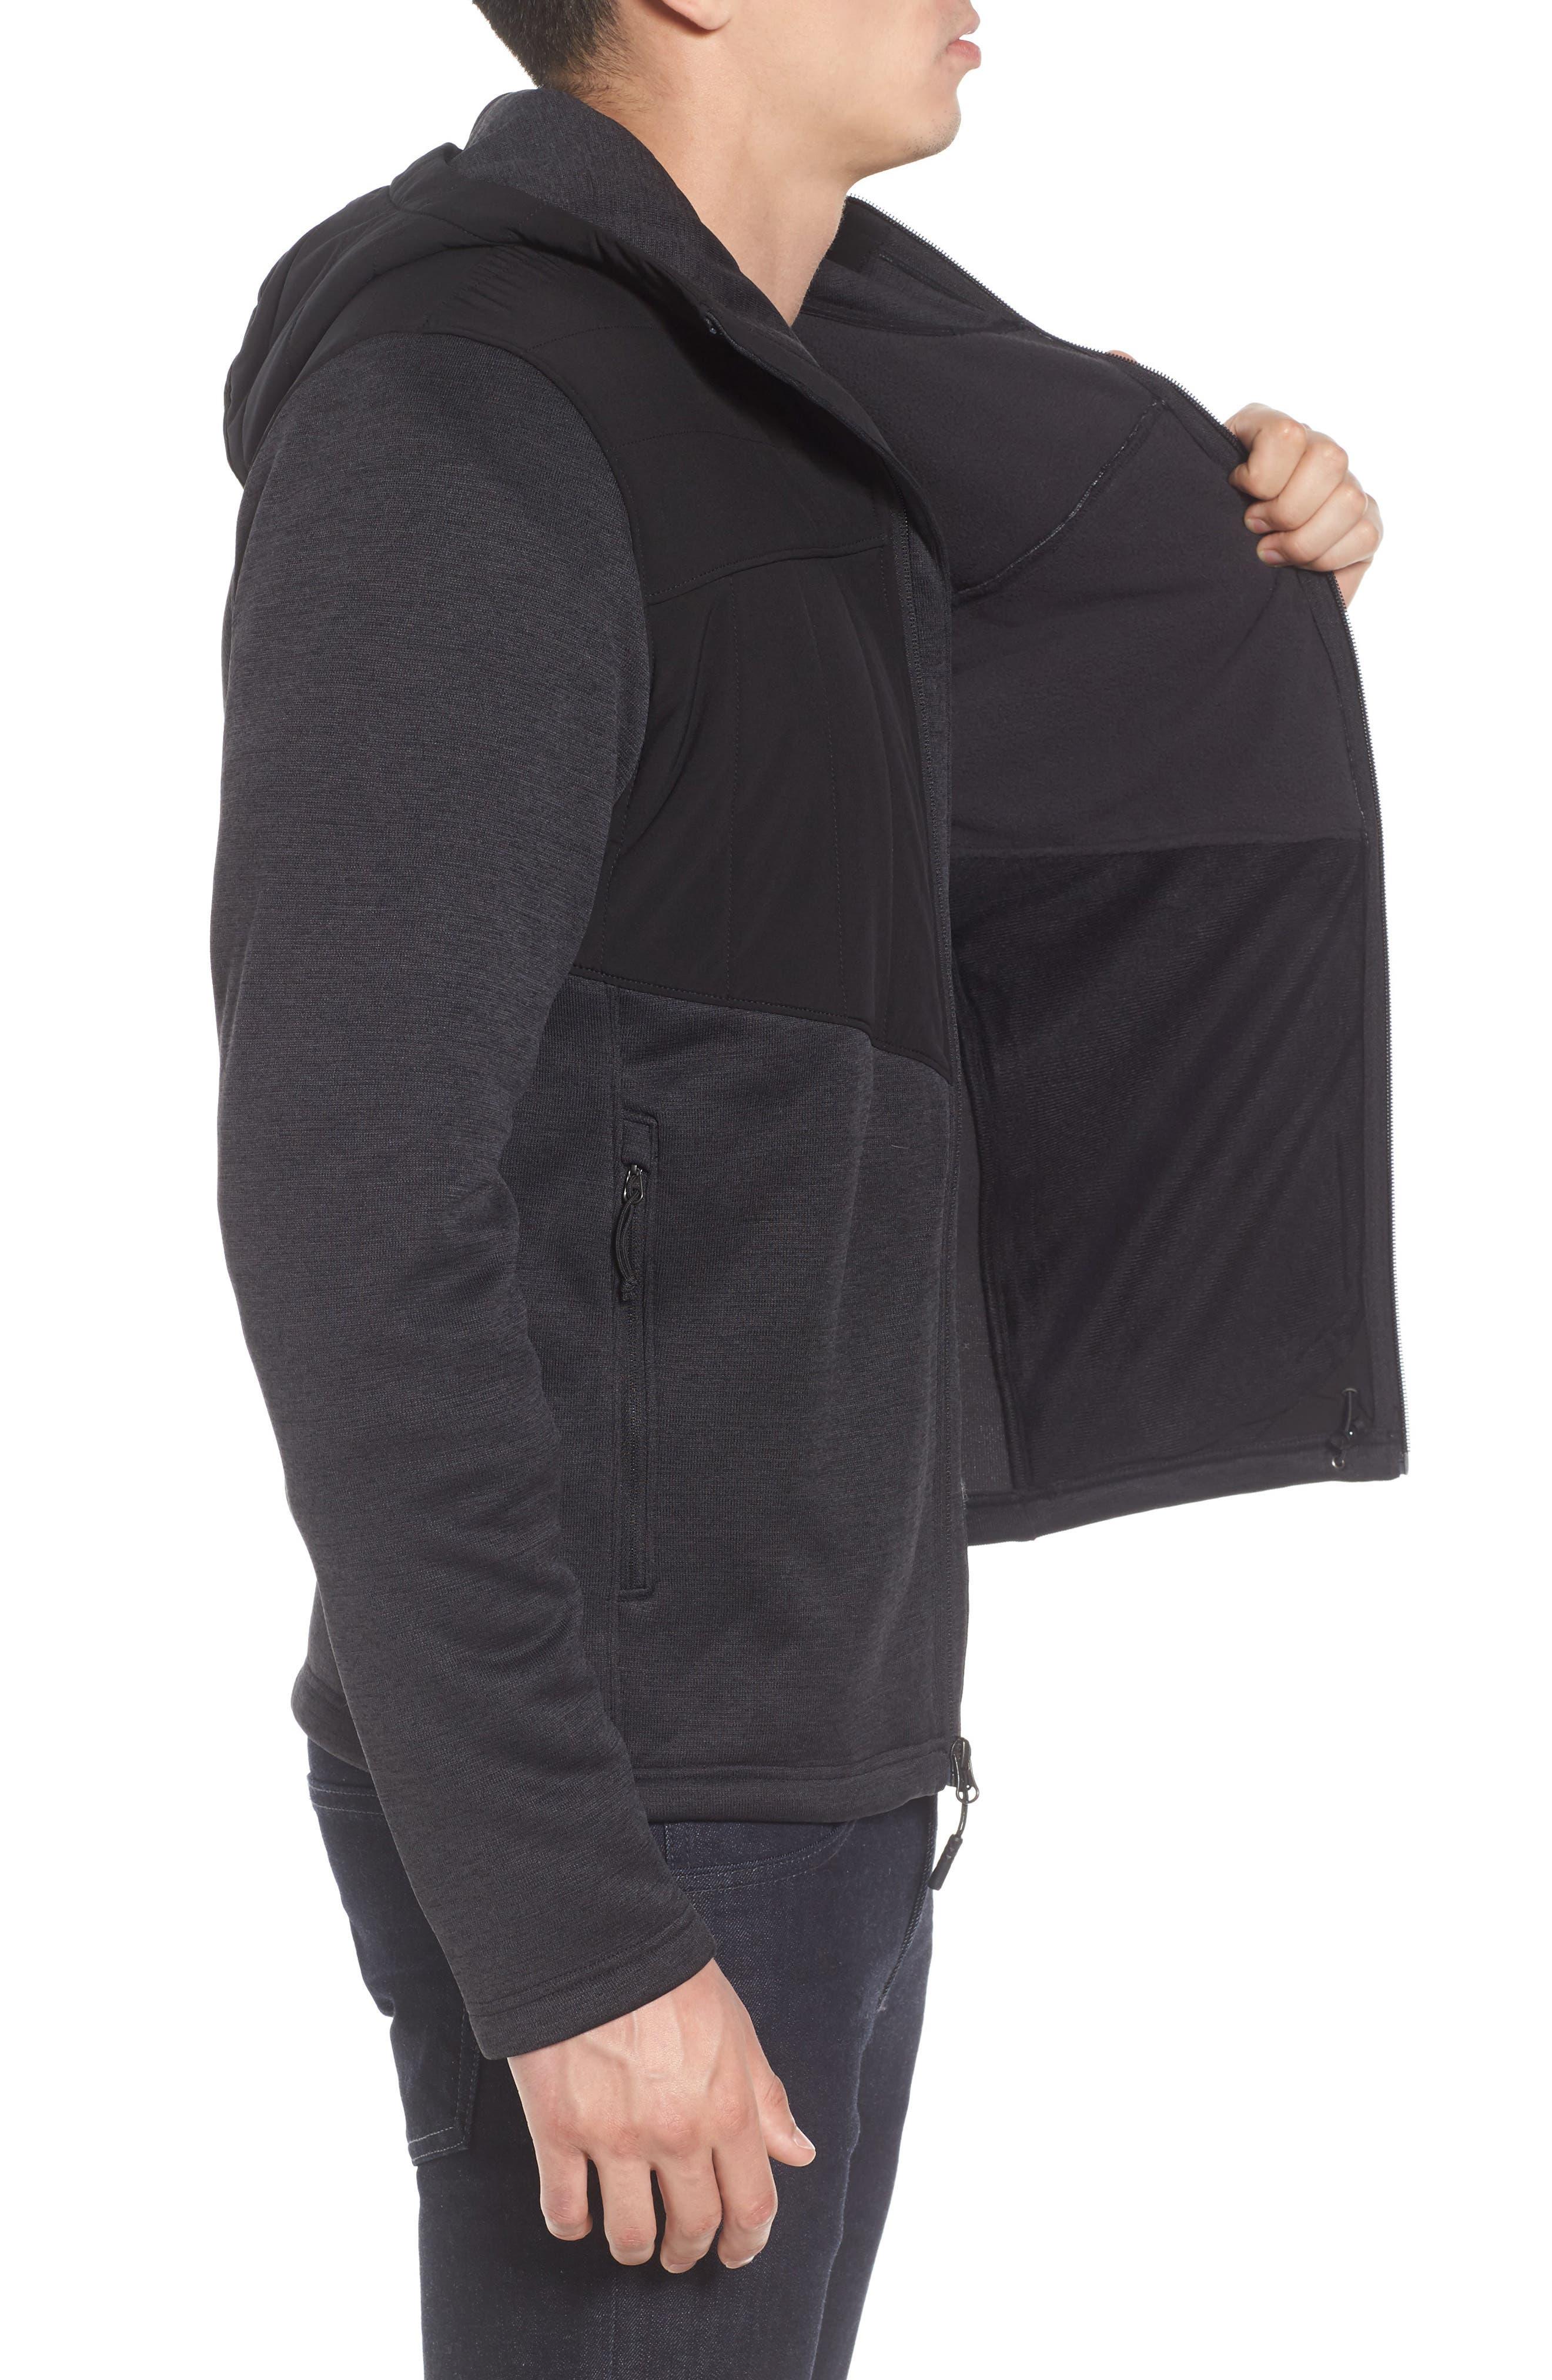 Norris Insulated Fleece Jacket,                             Alternate thumbnail 3, color,